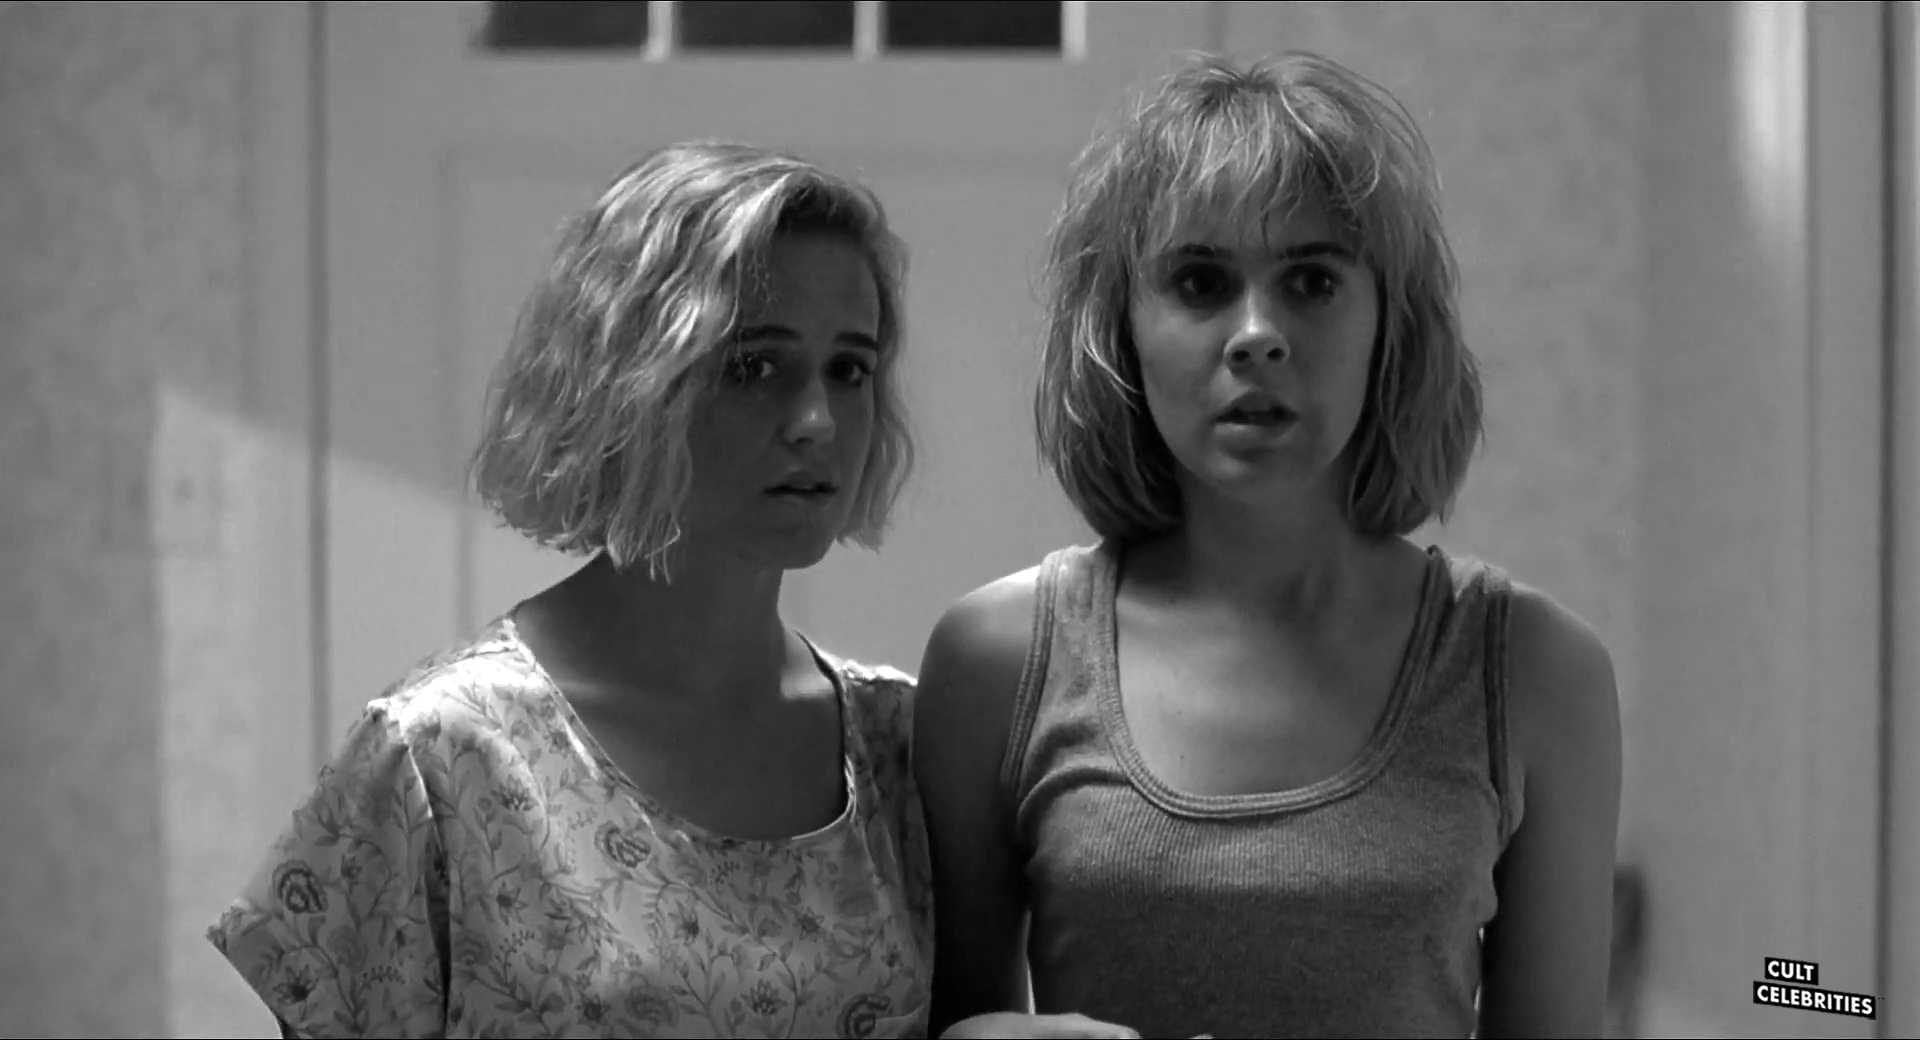 Brandi Burkett and Keely Christian in Slumber Party Massacre III (1990)